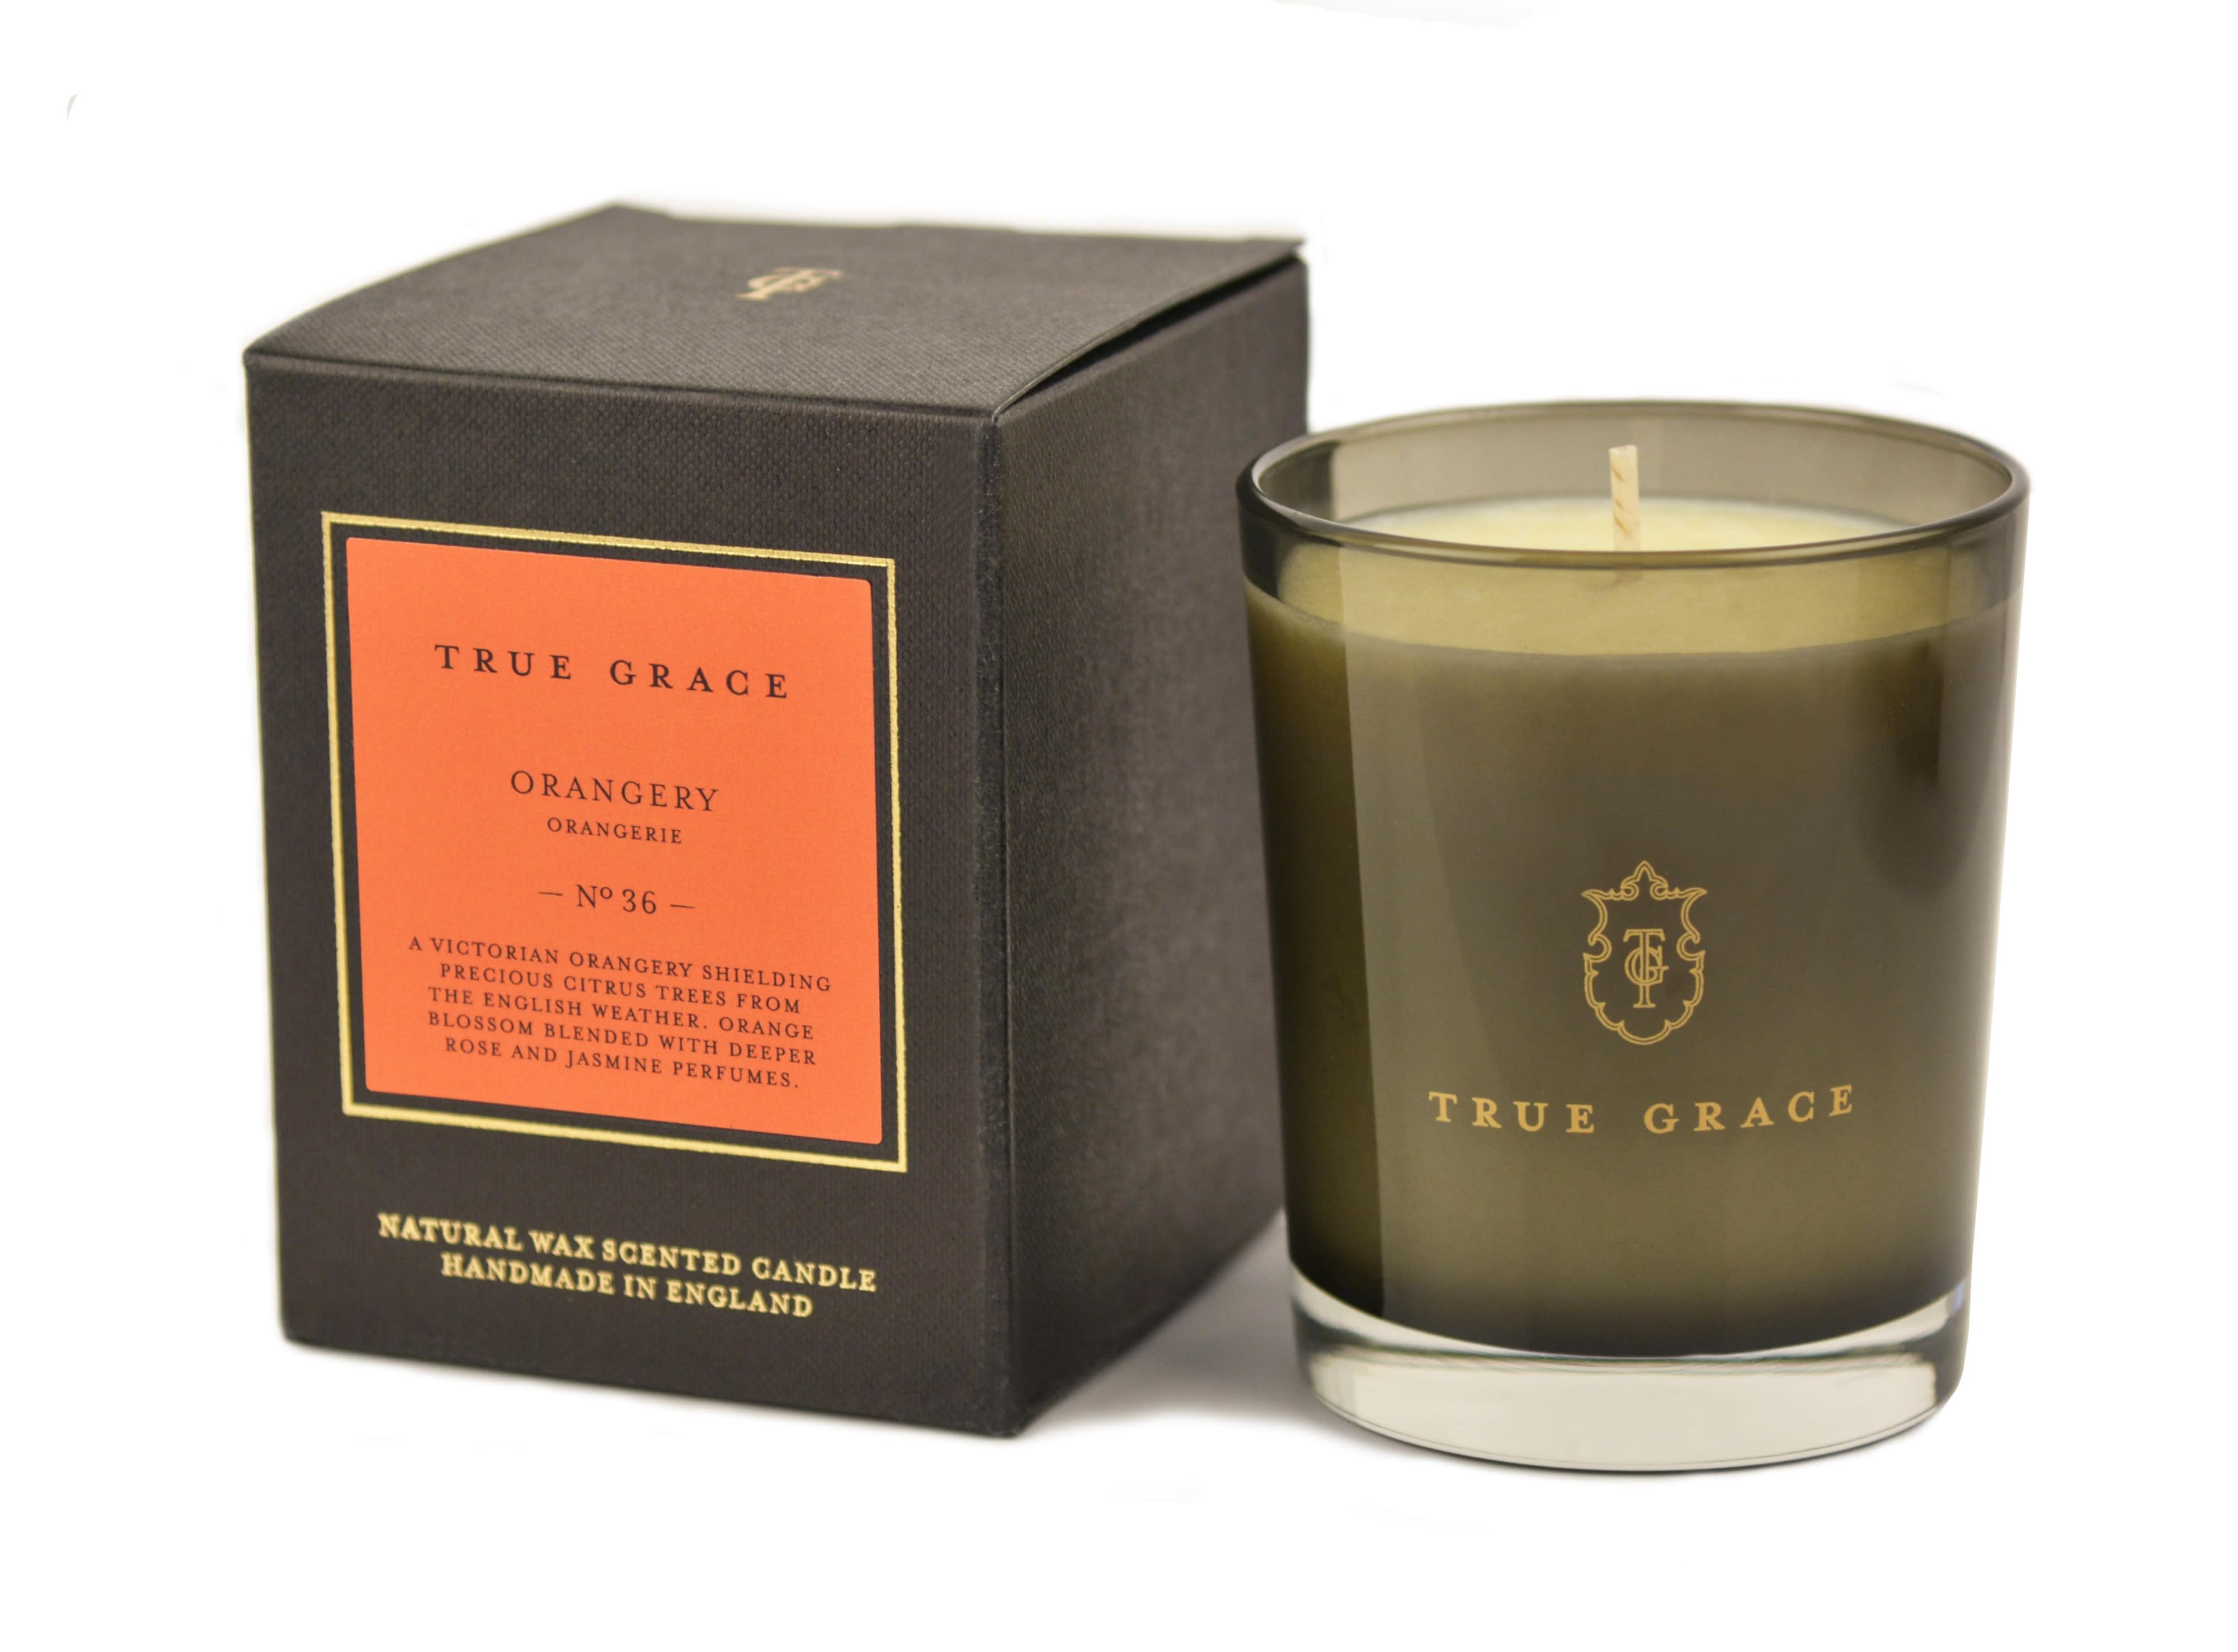 True Grace Orangery Candle